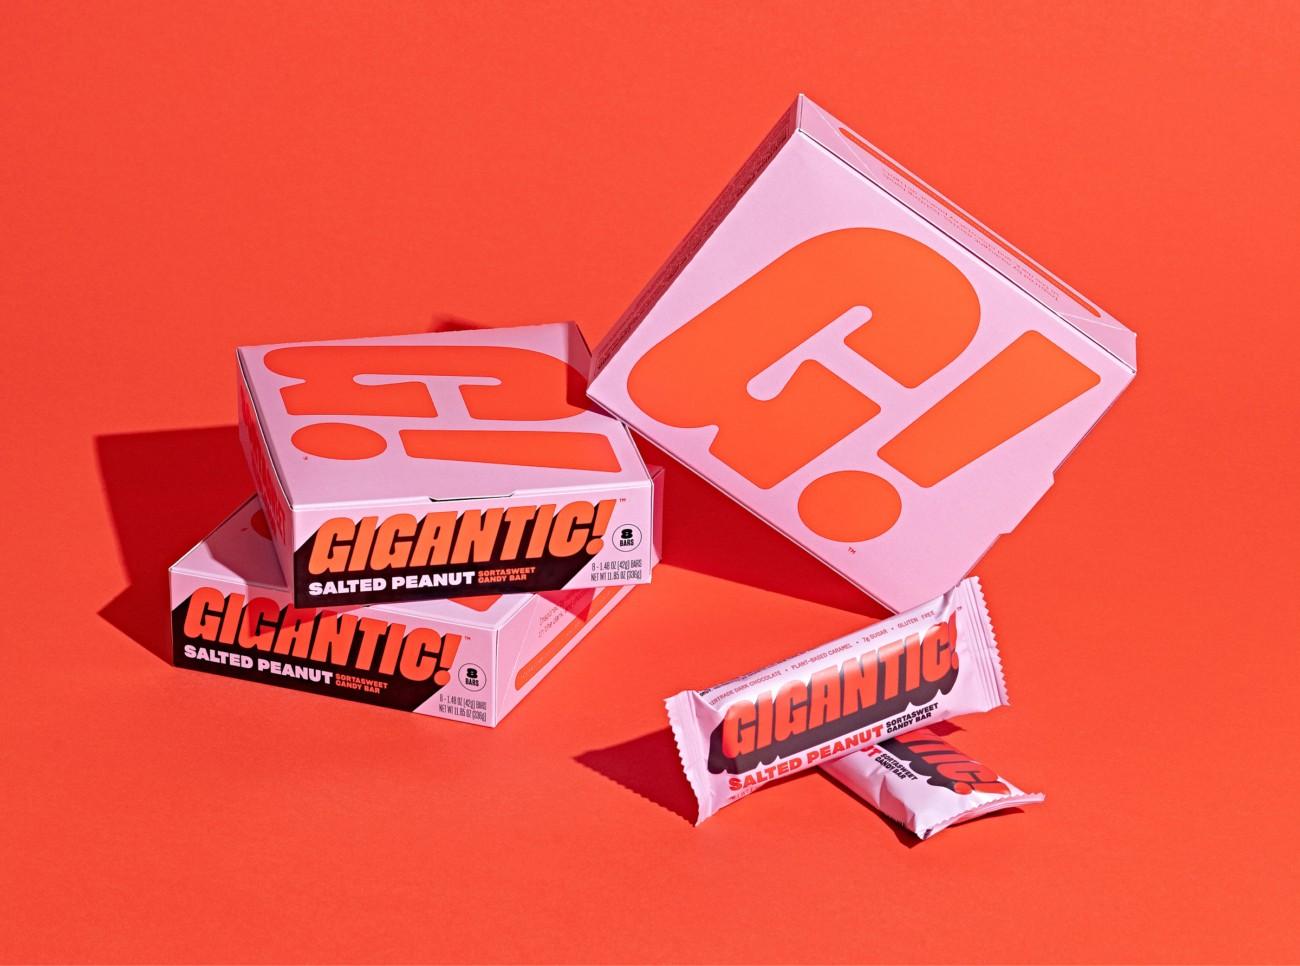 GIGANTIC!巧克力棒零食包装w88手机官网平台首页